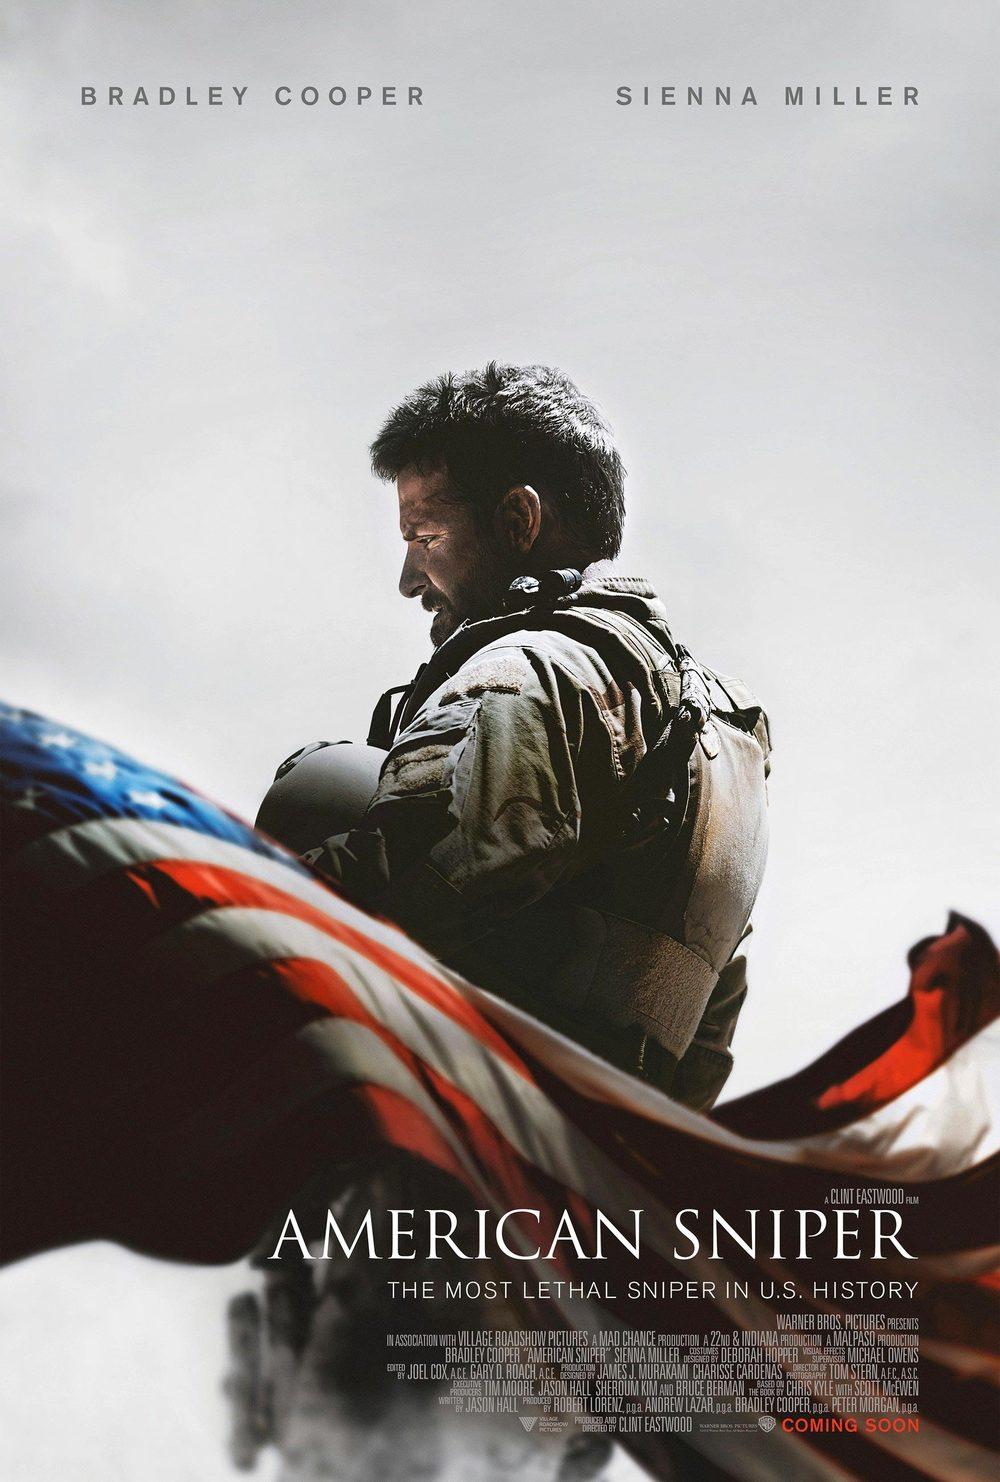 americansniper poster